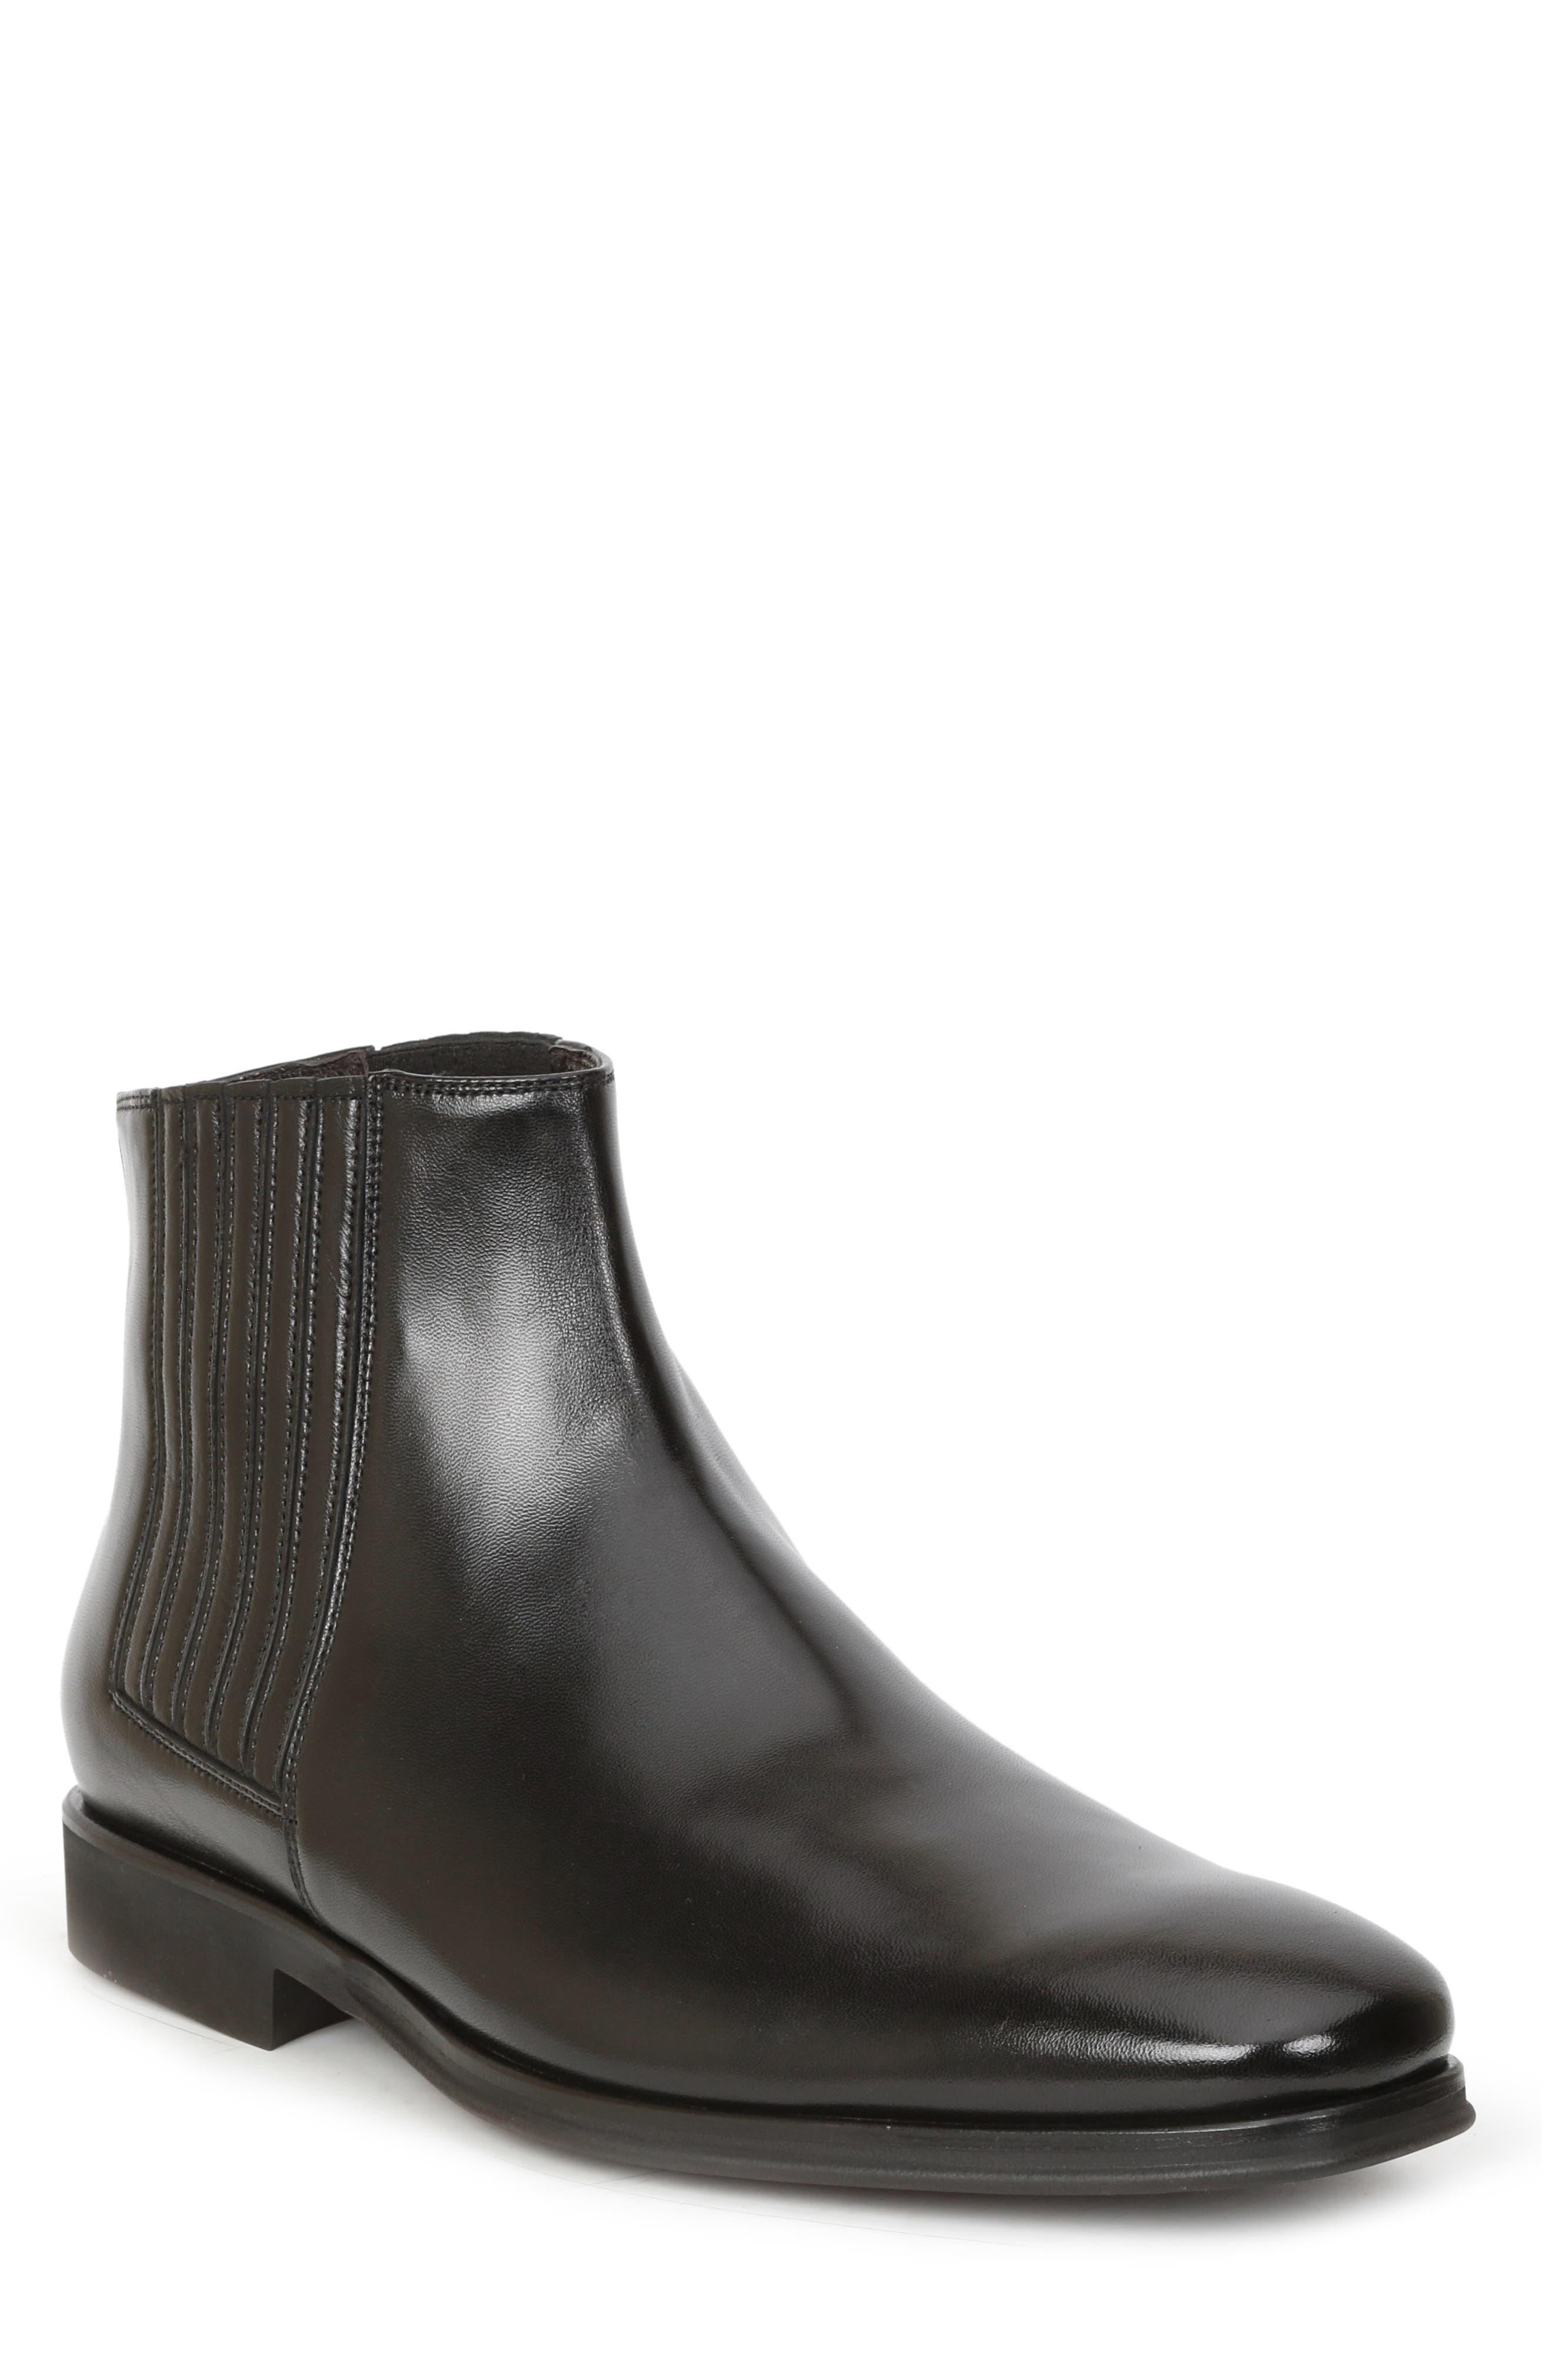 Rezzo Chelsea Boot,                             Main thumbnail 1, color,                             BLACK